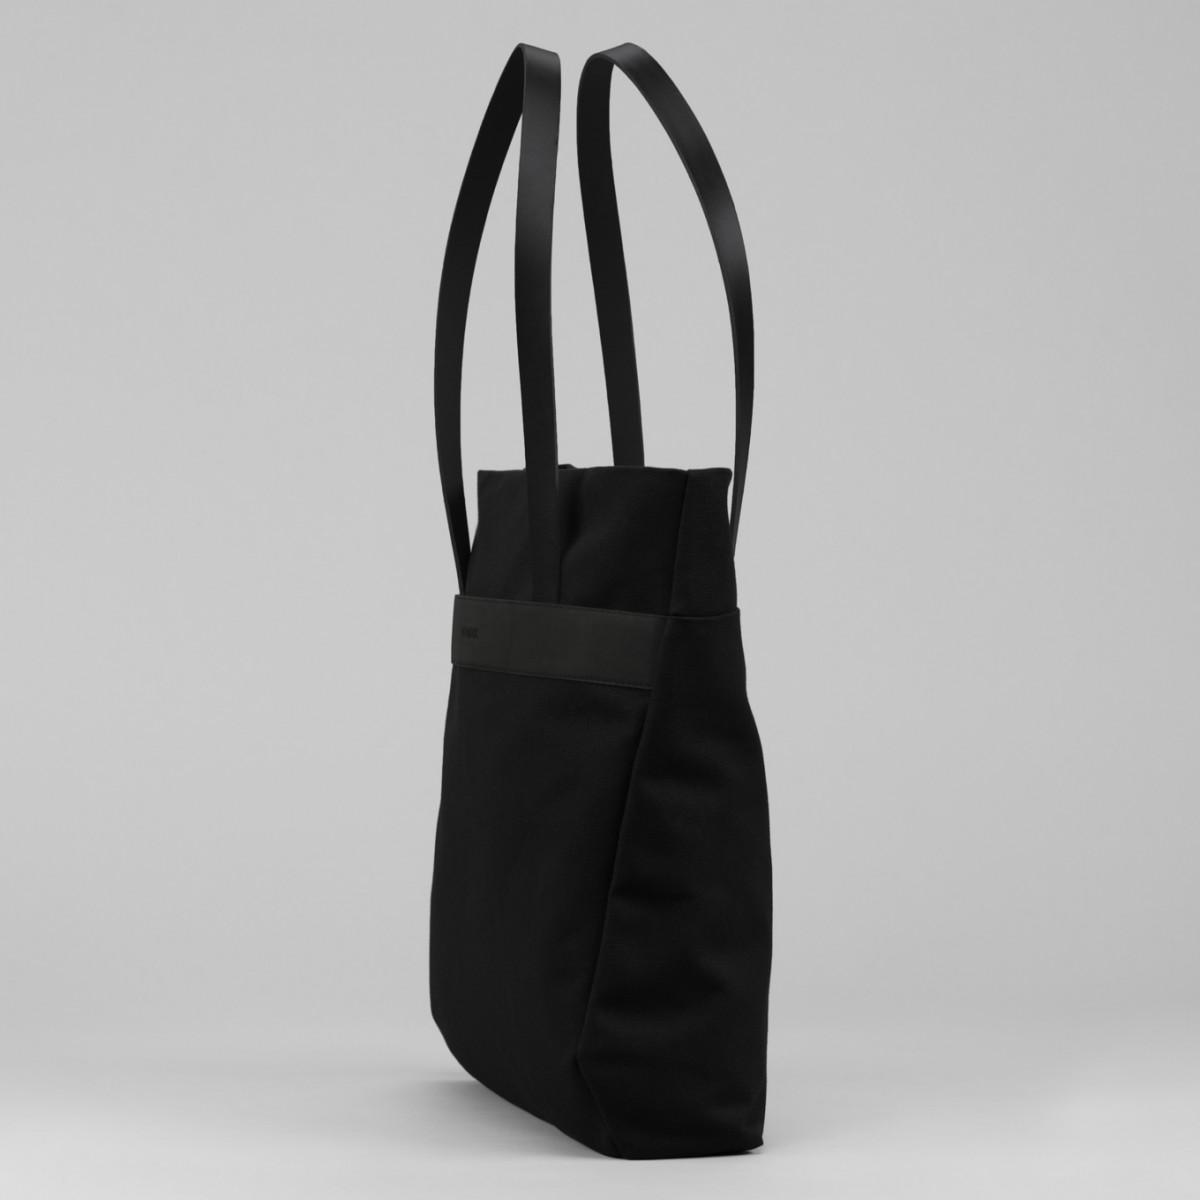 VANOOK Shopper Black